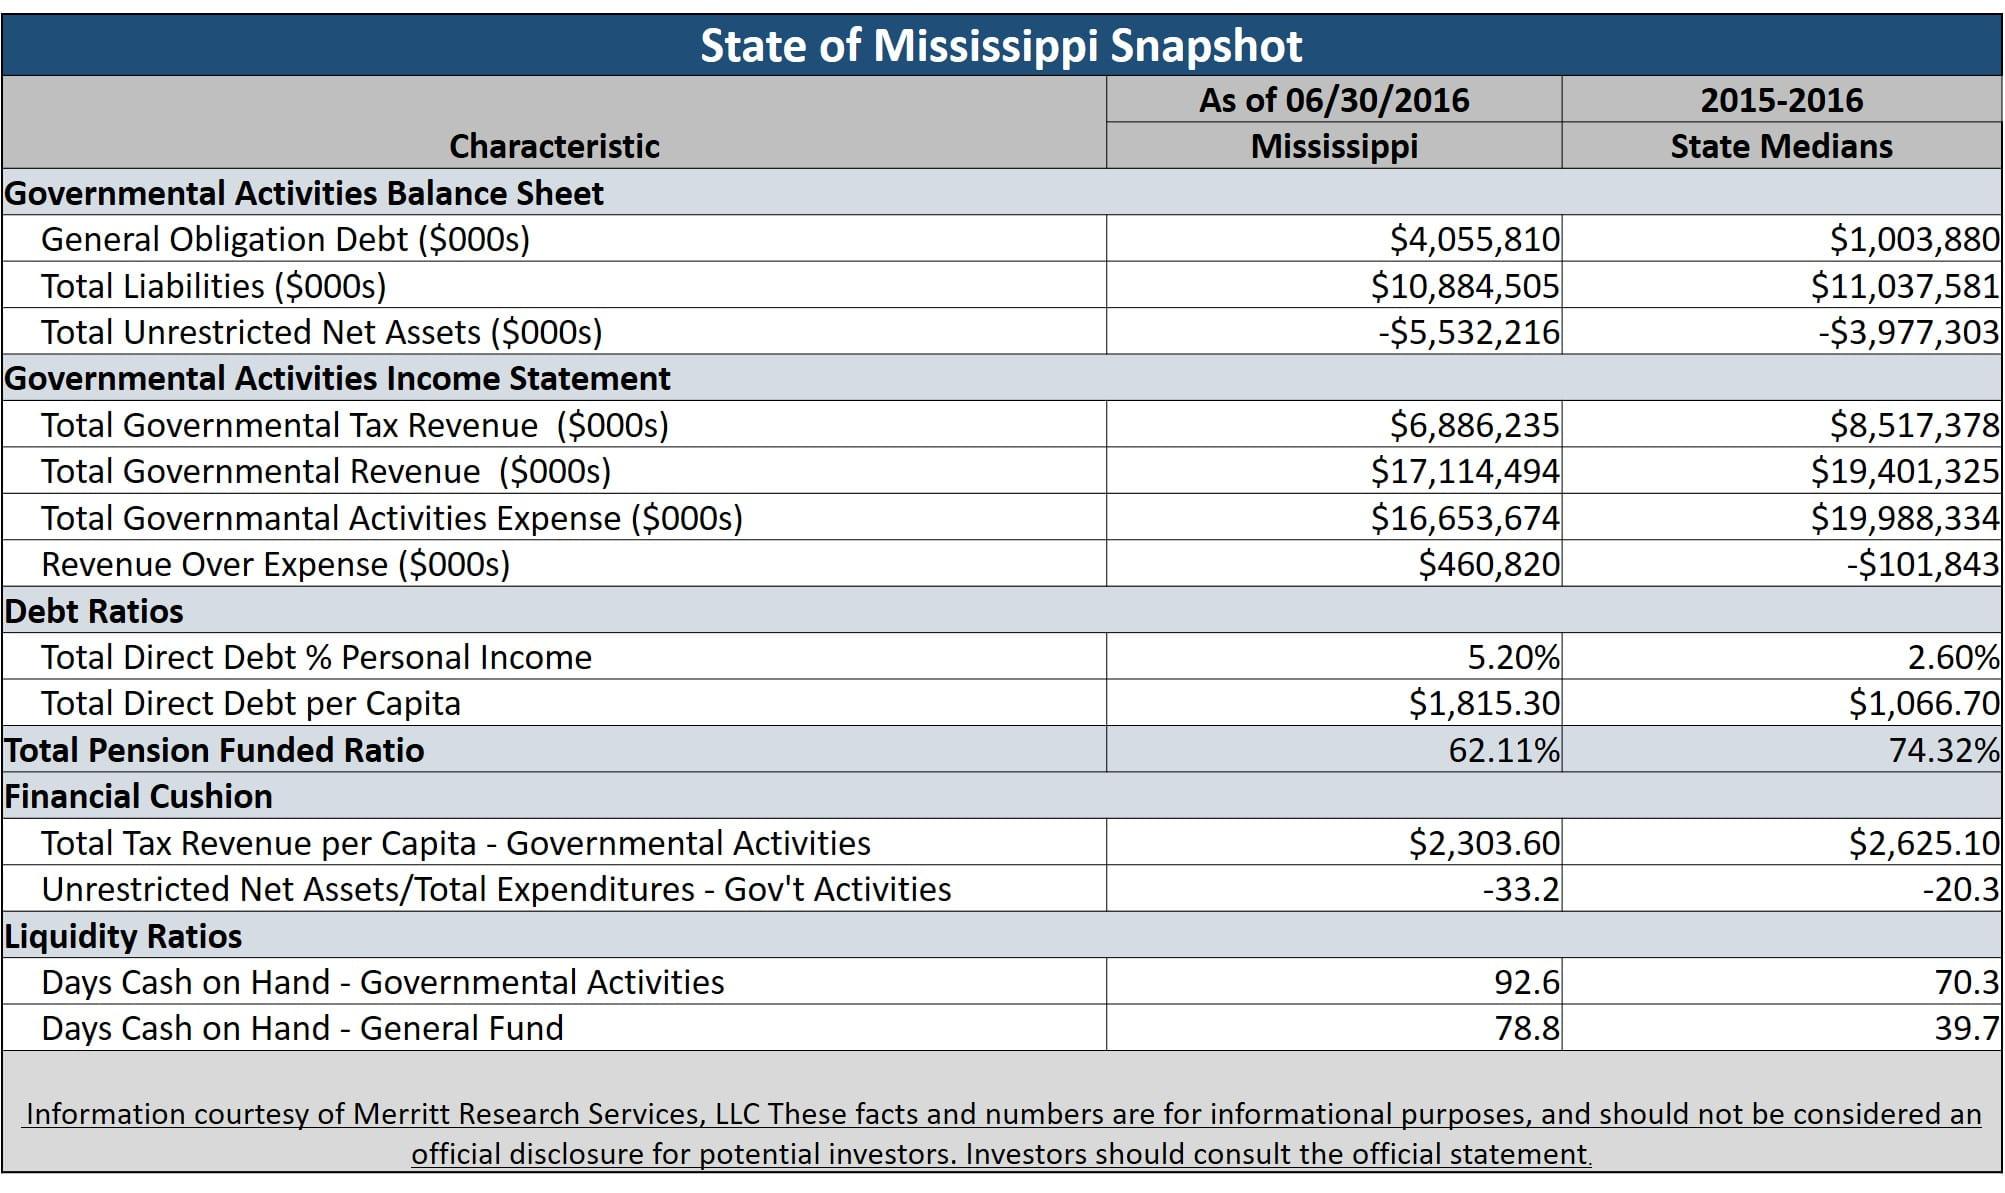 Municipal Bond Featured Snapshot - State of Mississippi